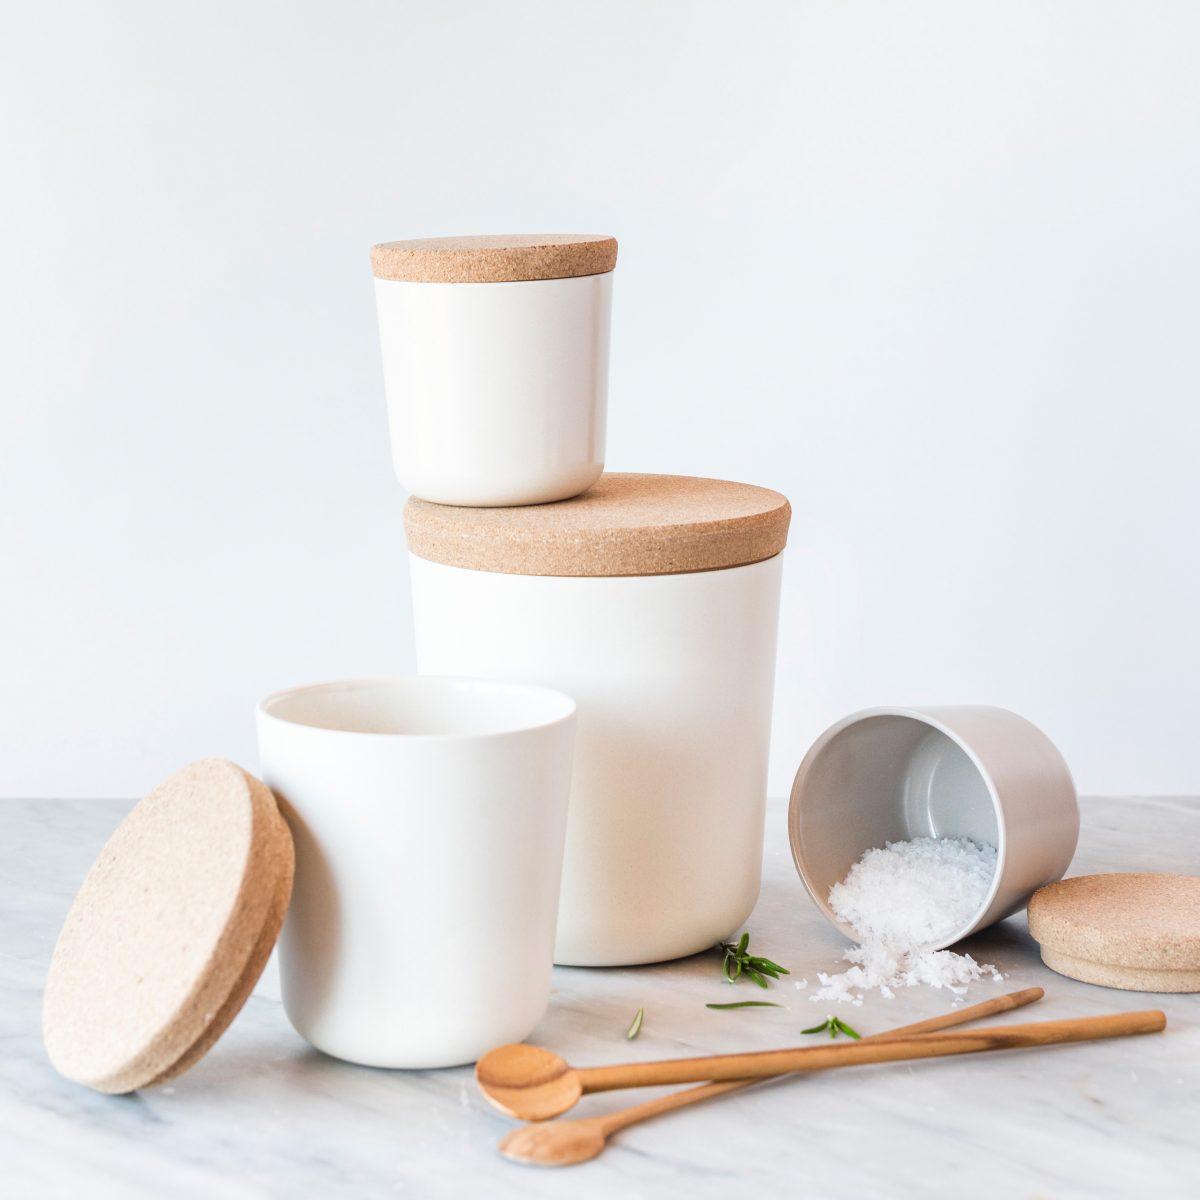 ekobo storage jars 4 sizes